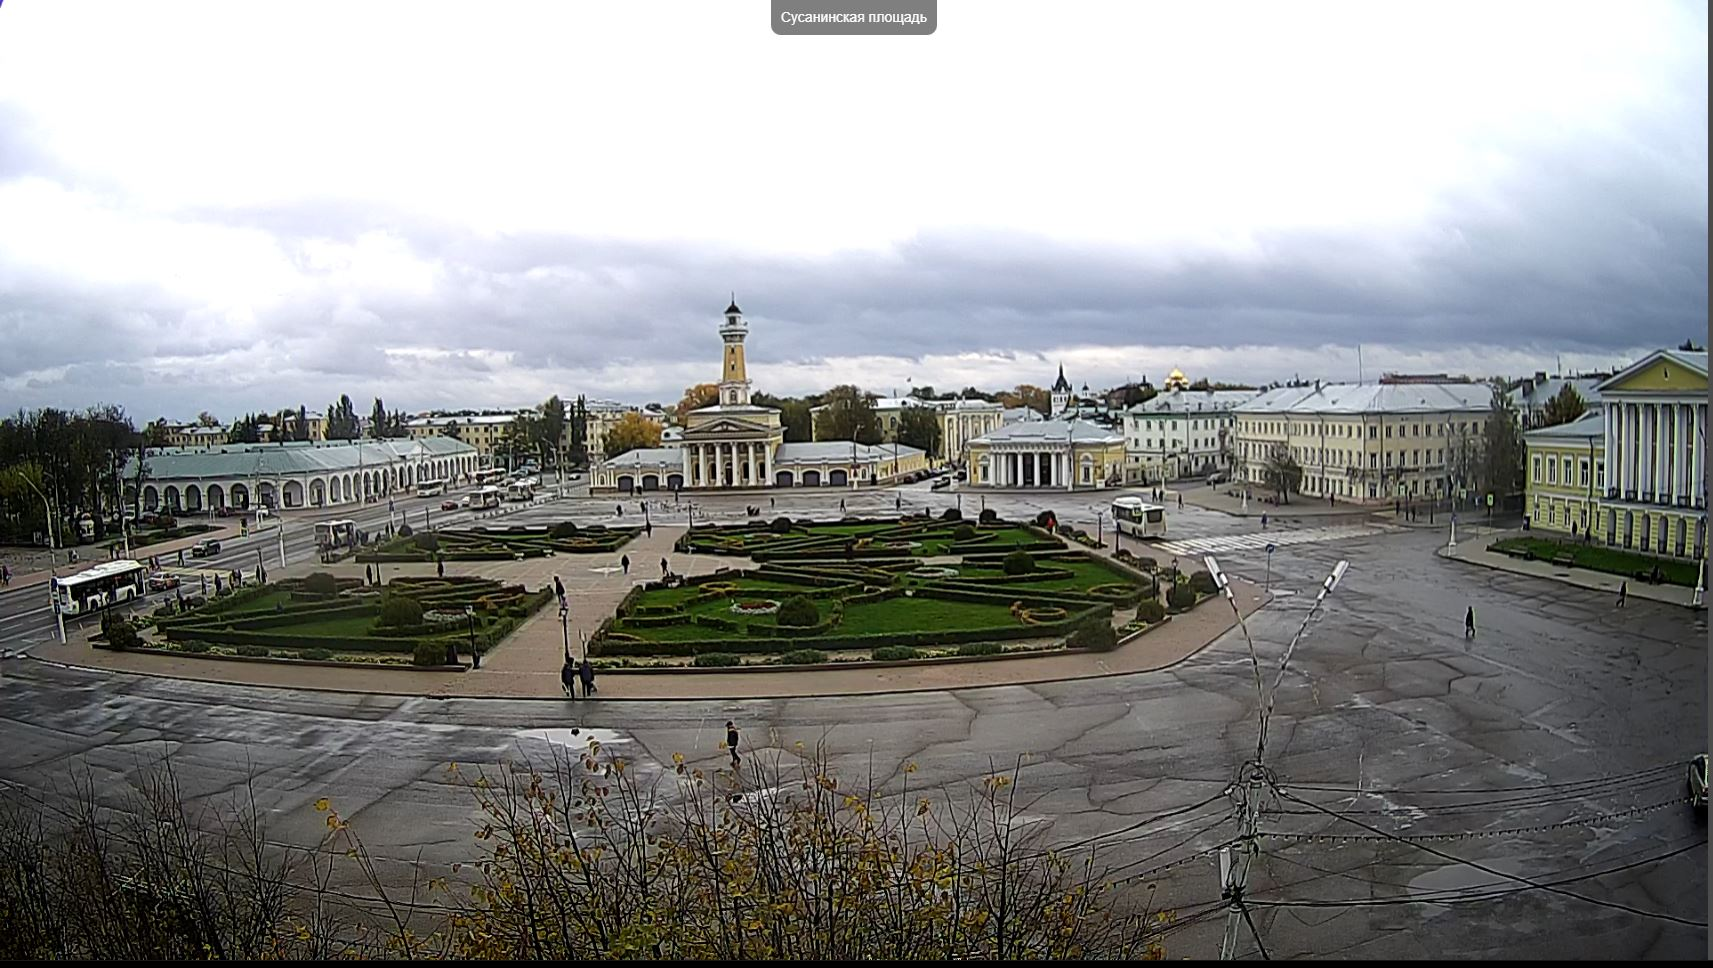 webcam Kostroma